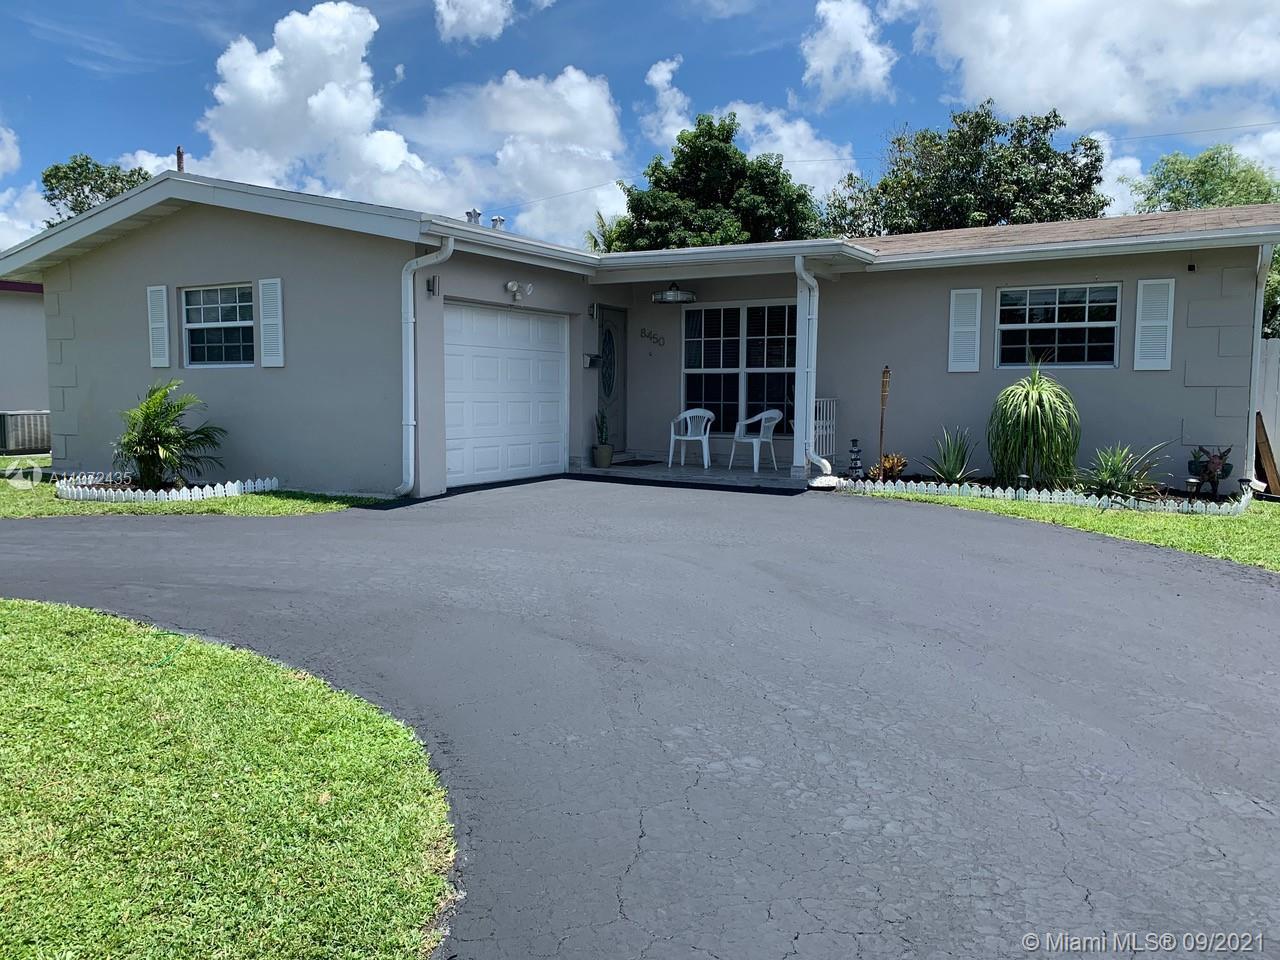 Sunrise Golf Village - 8450 NW 26th St, Sunrise, FL 33322